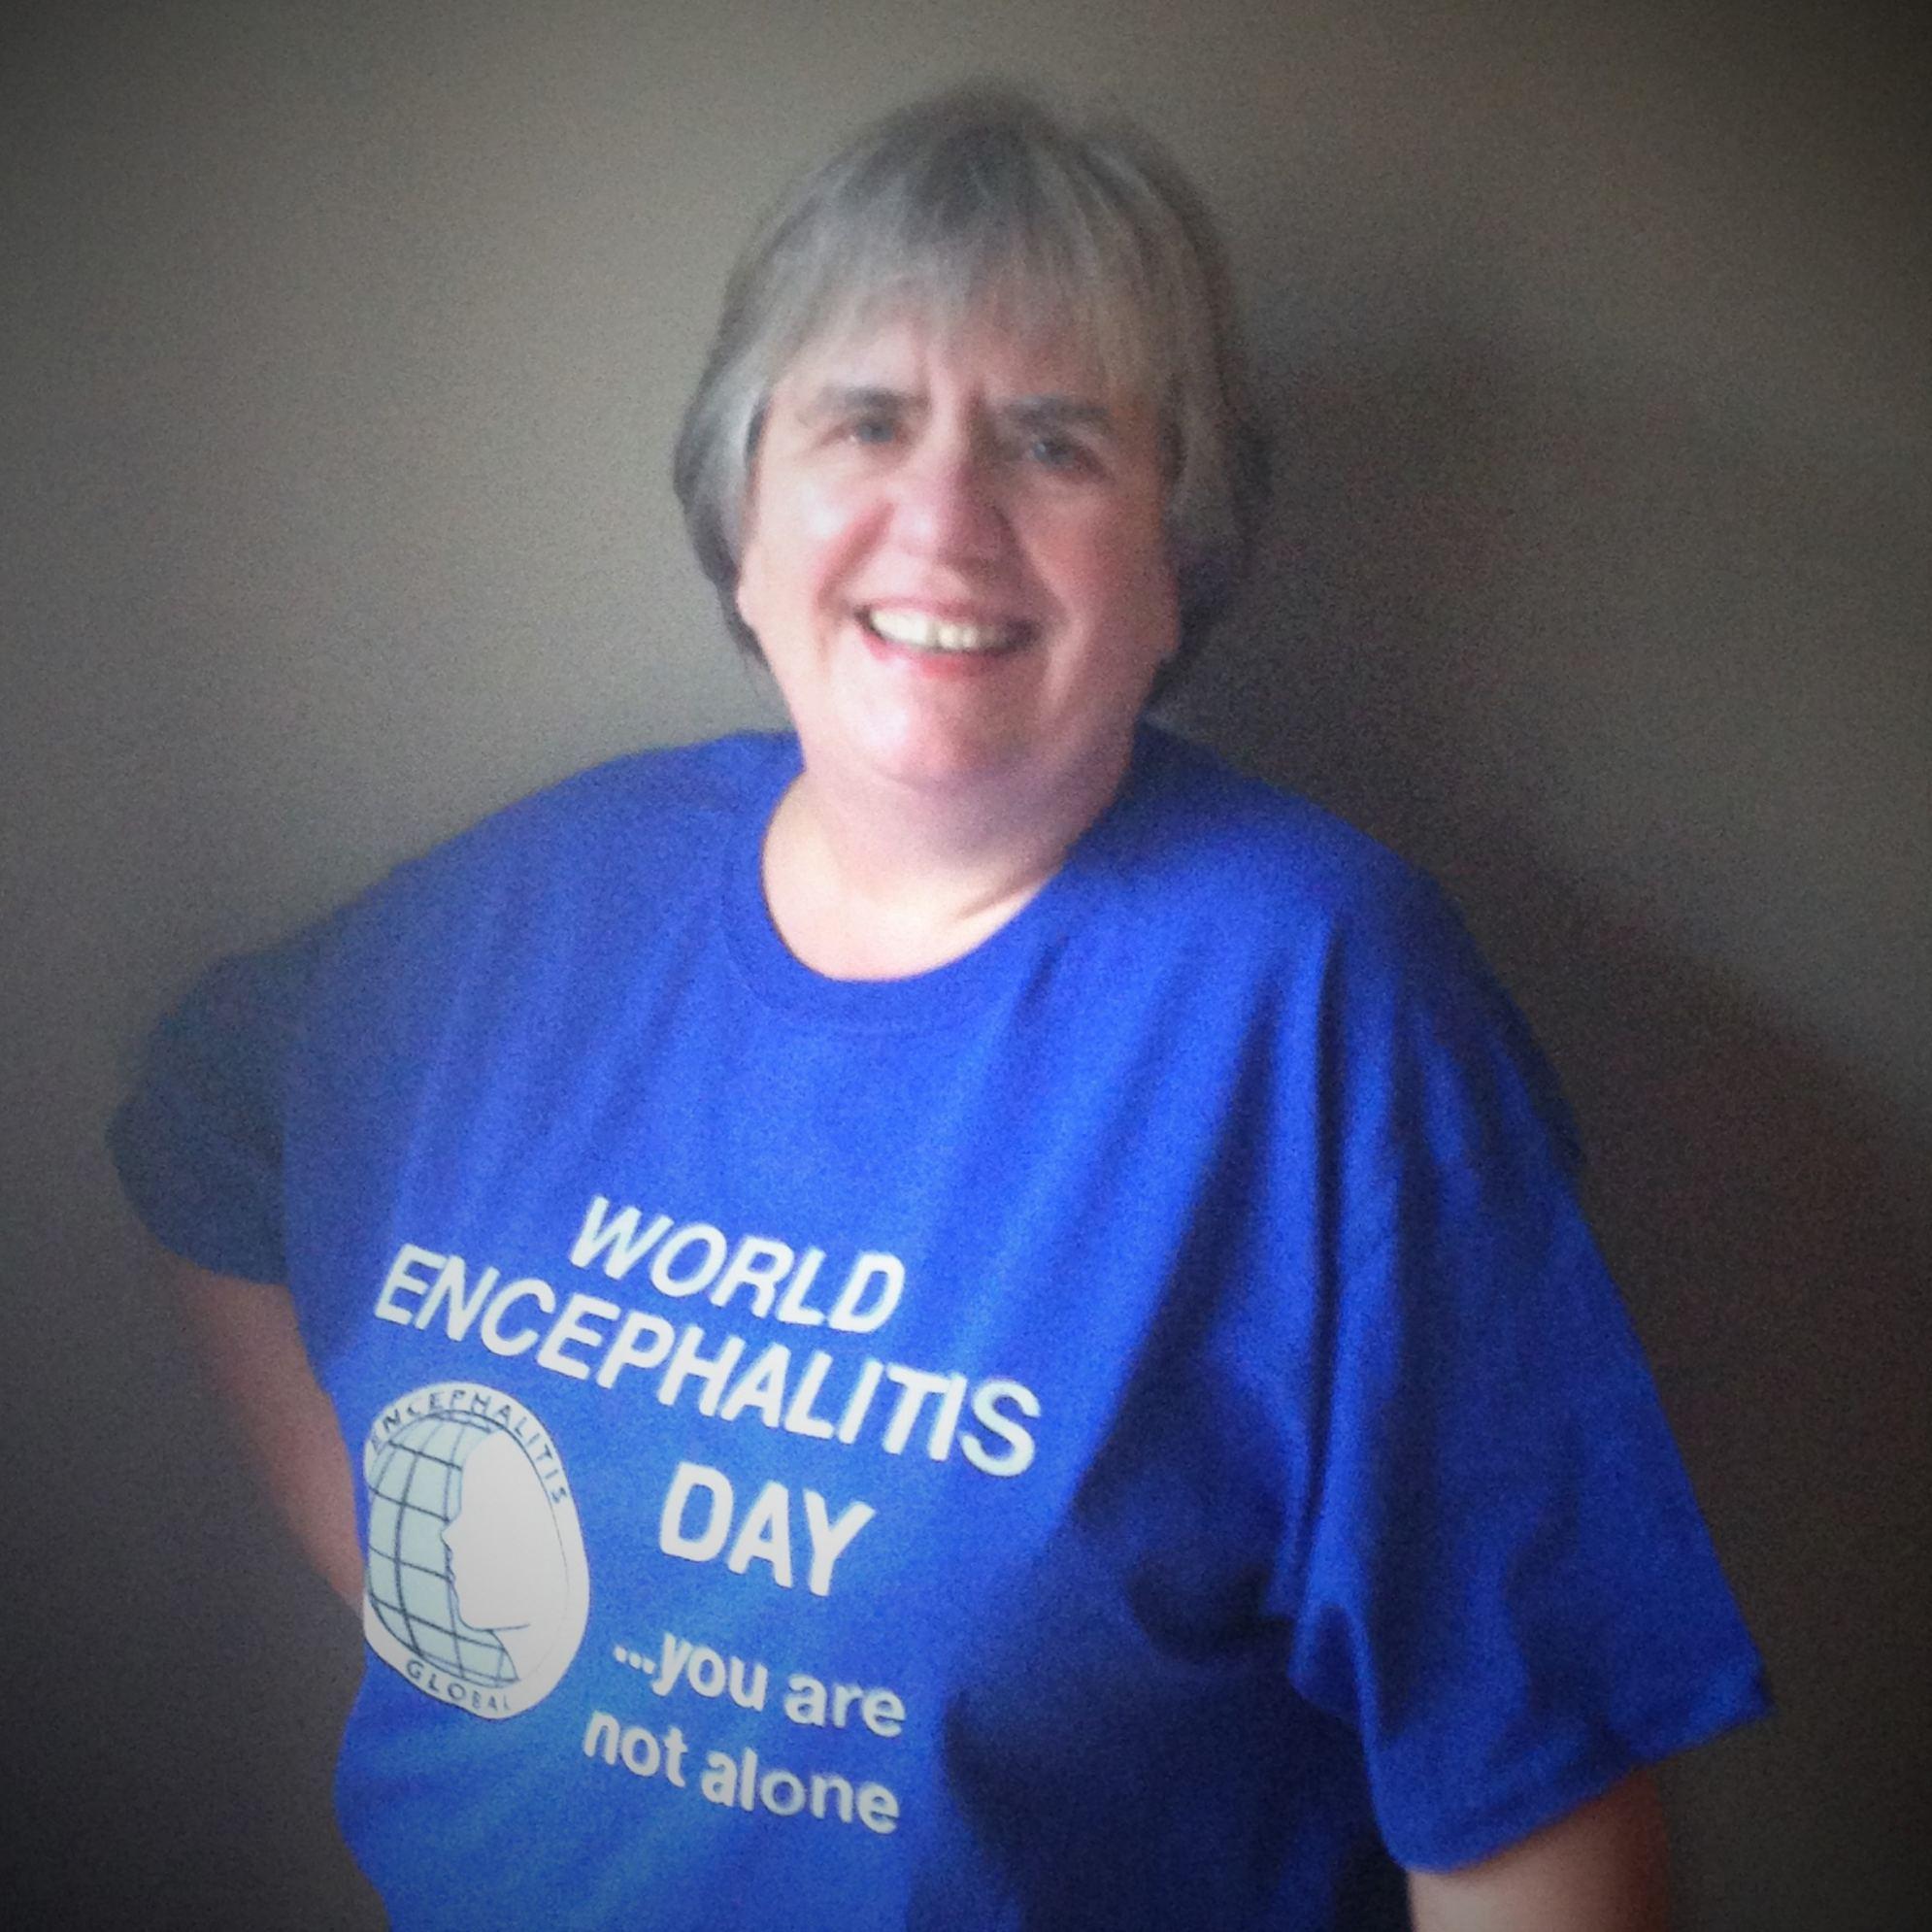 Wendy Station - World Encephalitis Day